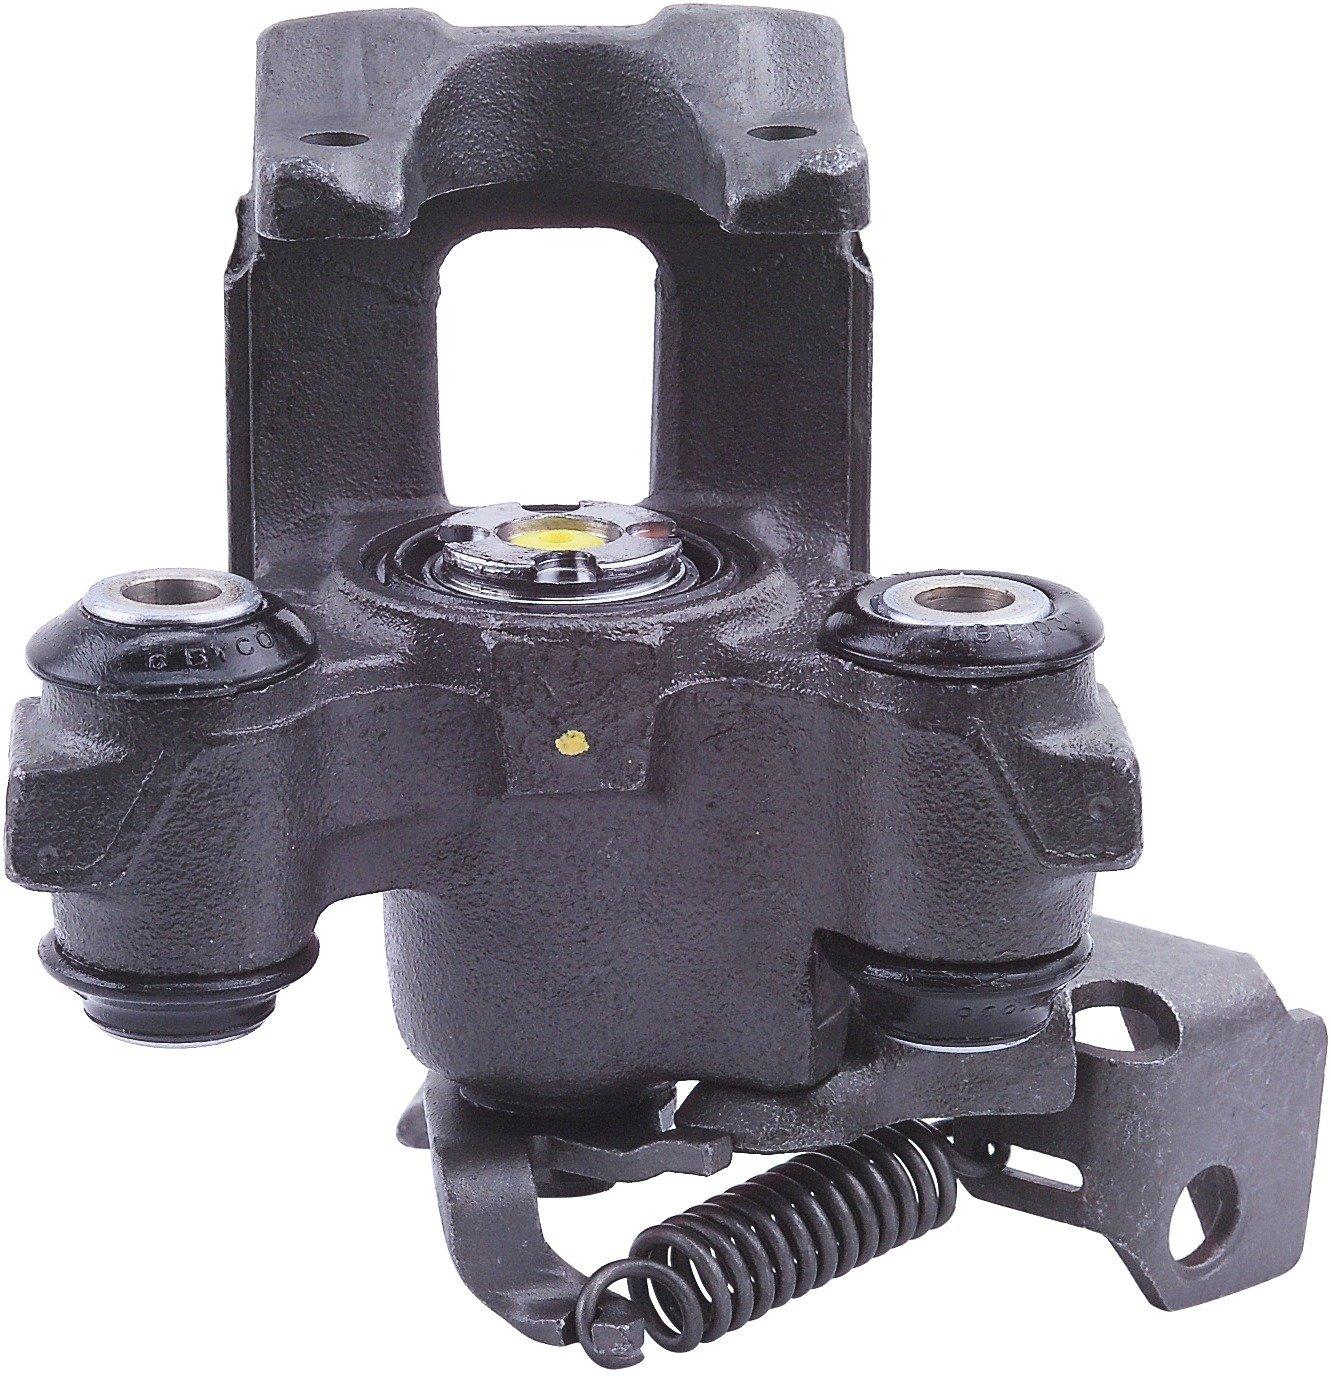 Cardone 18-4327 Remanufactured Domestic Friction Ready Brake Caliper Unloaded